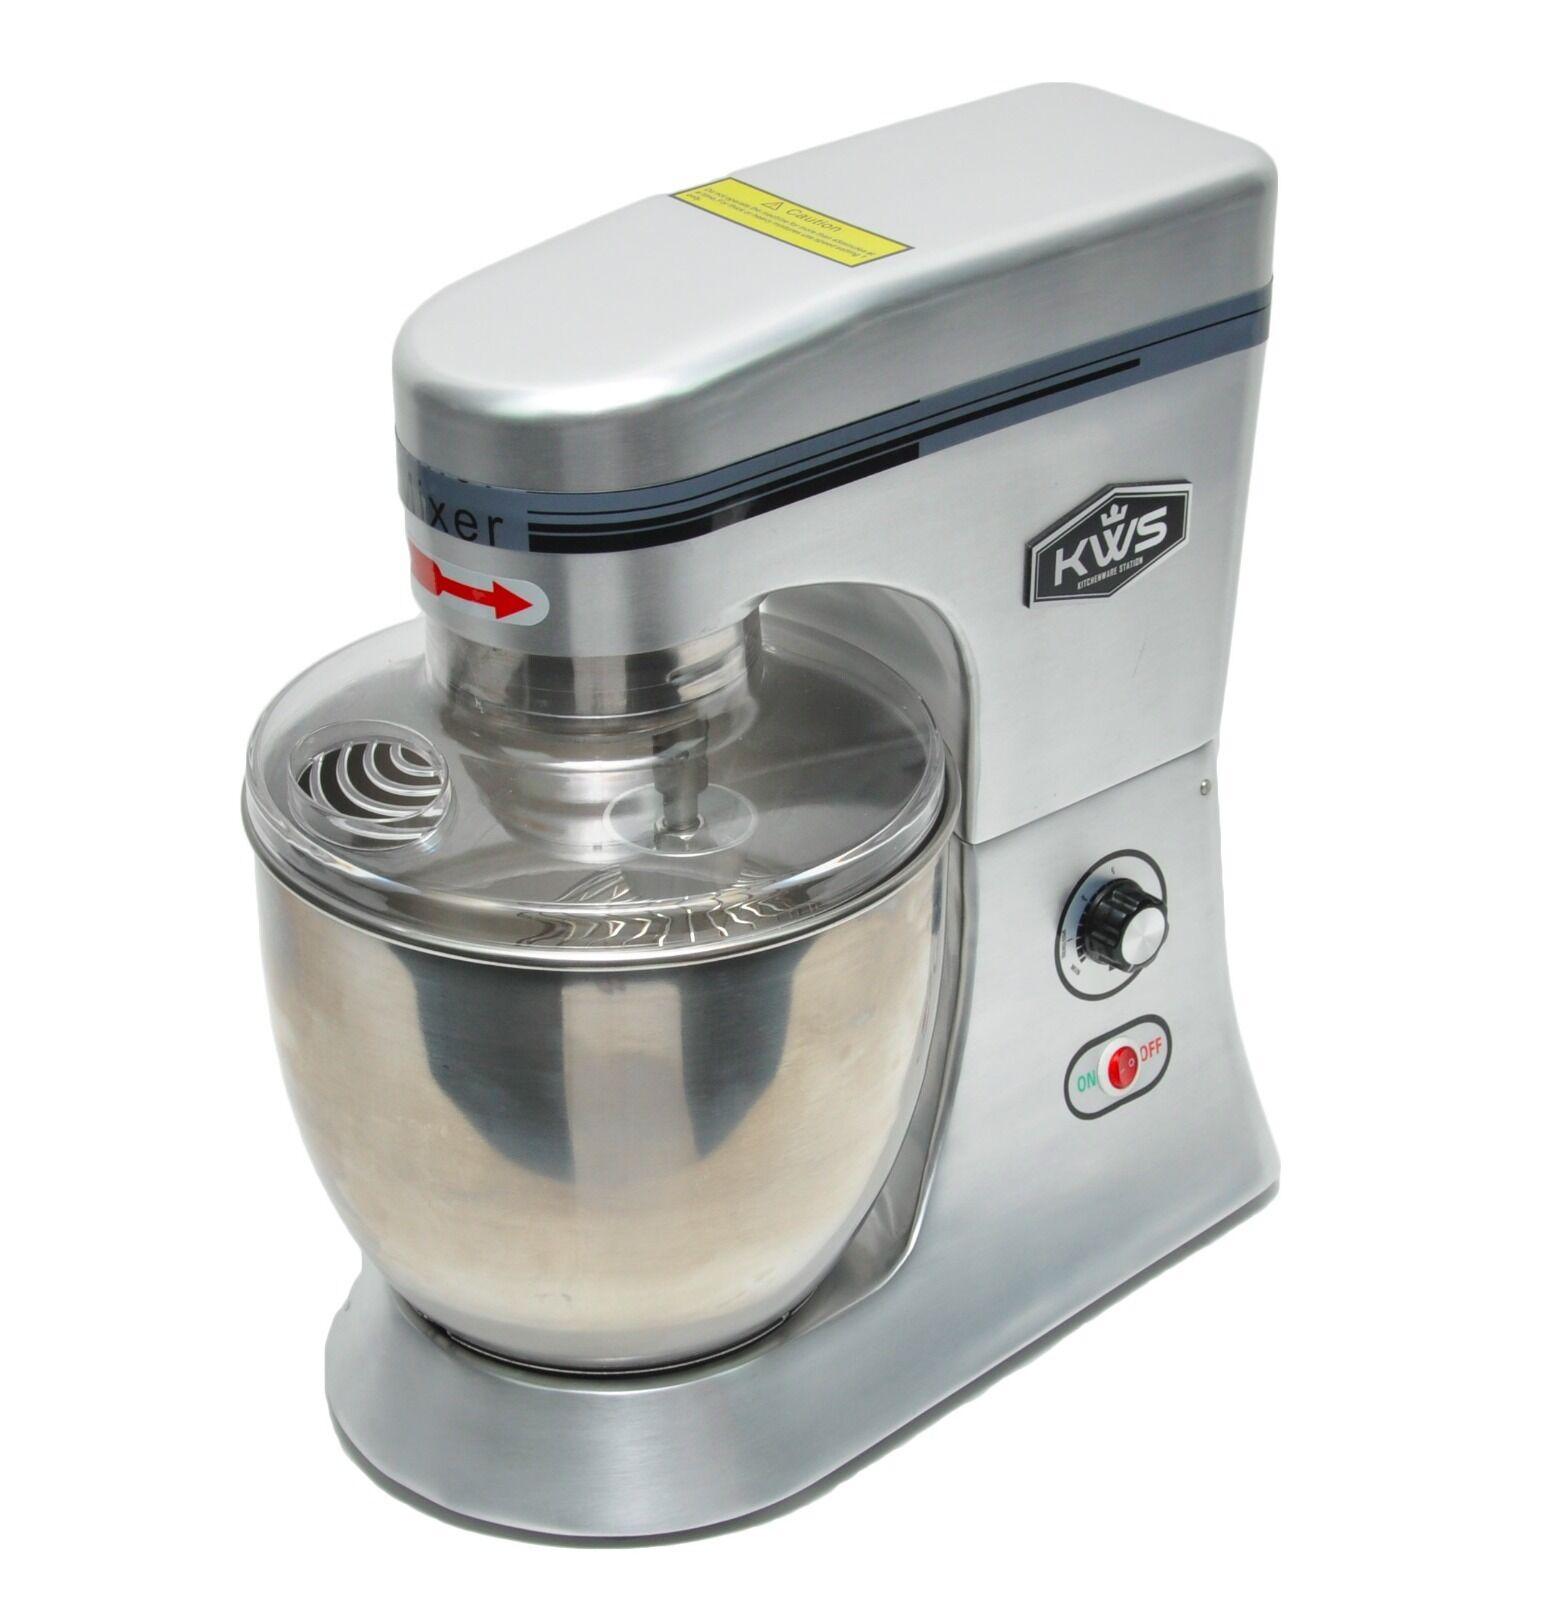 KWS Premium Commercial Class Stand Food Mixer-Heavy-duty 7Lfor  Restaurant/Bakery